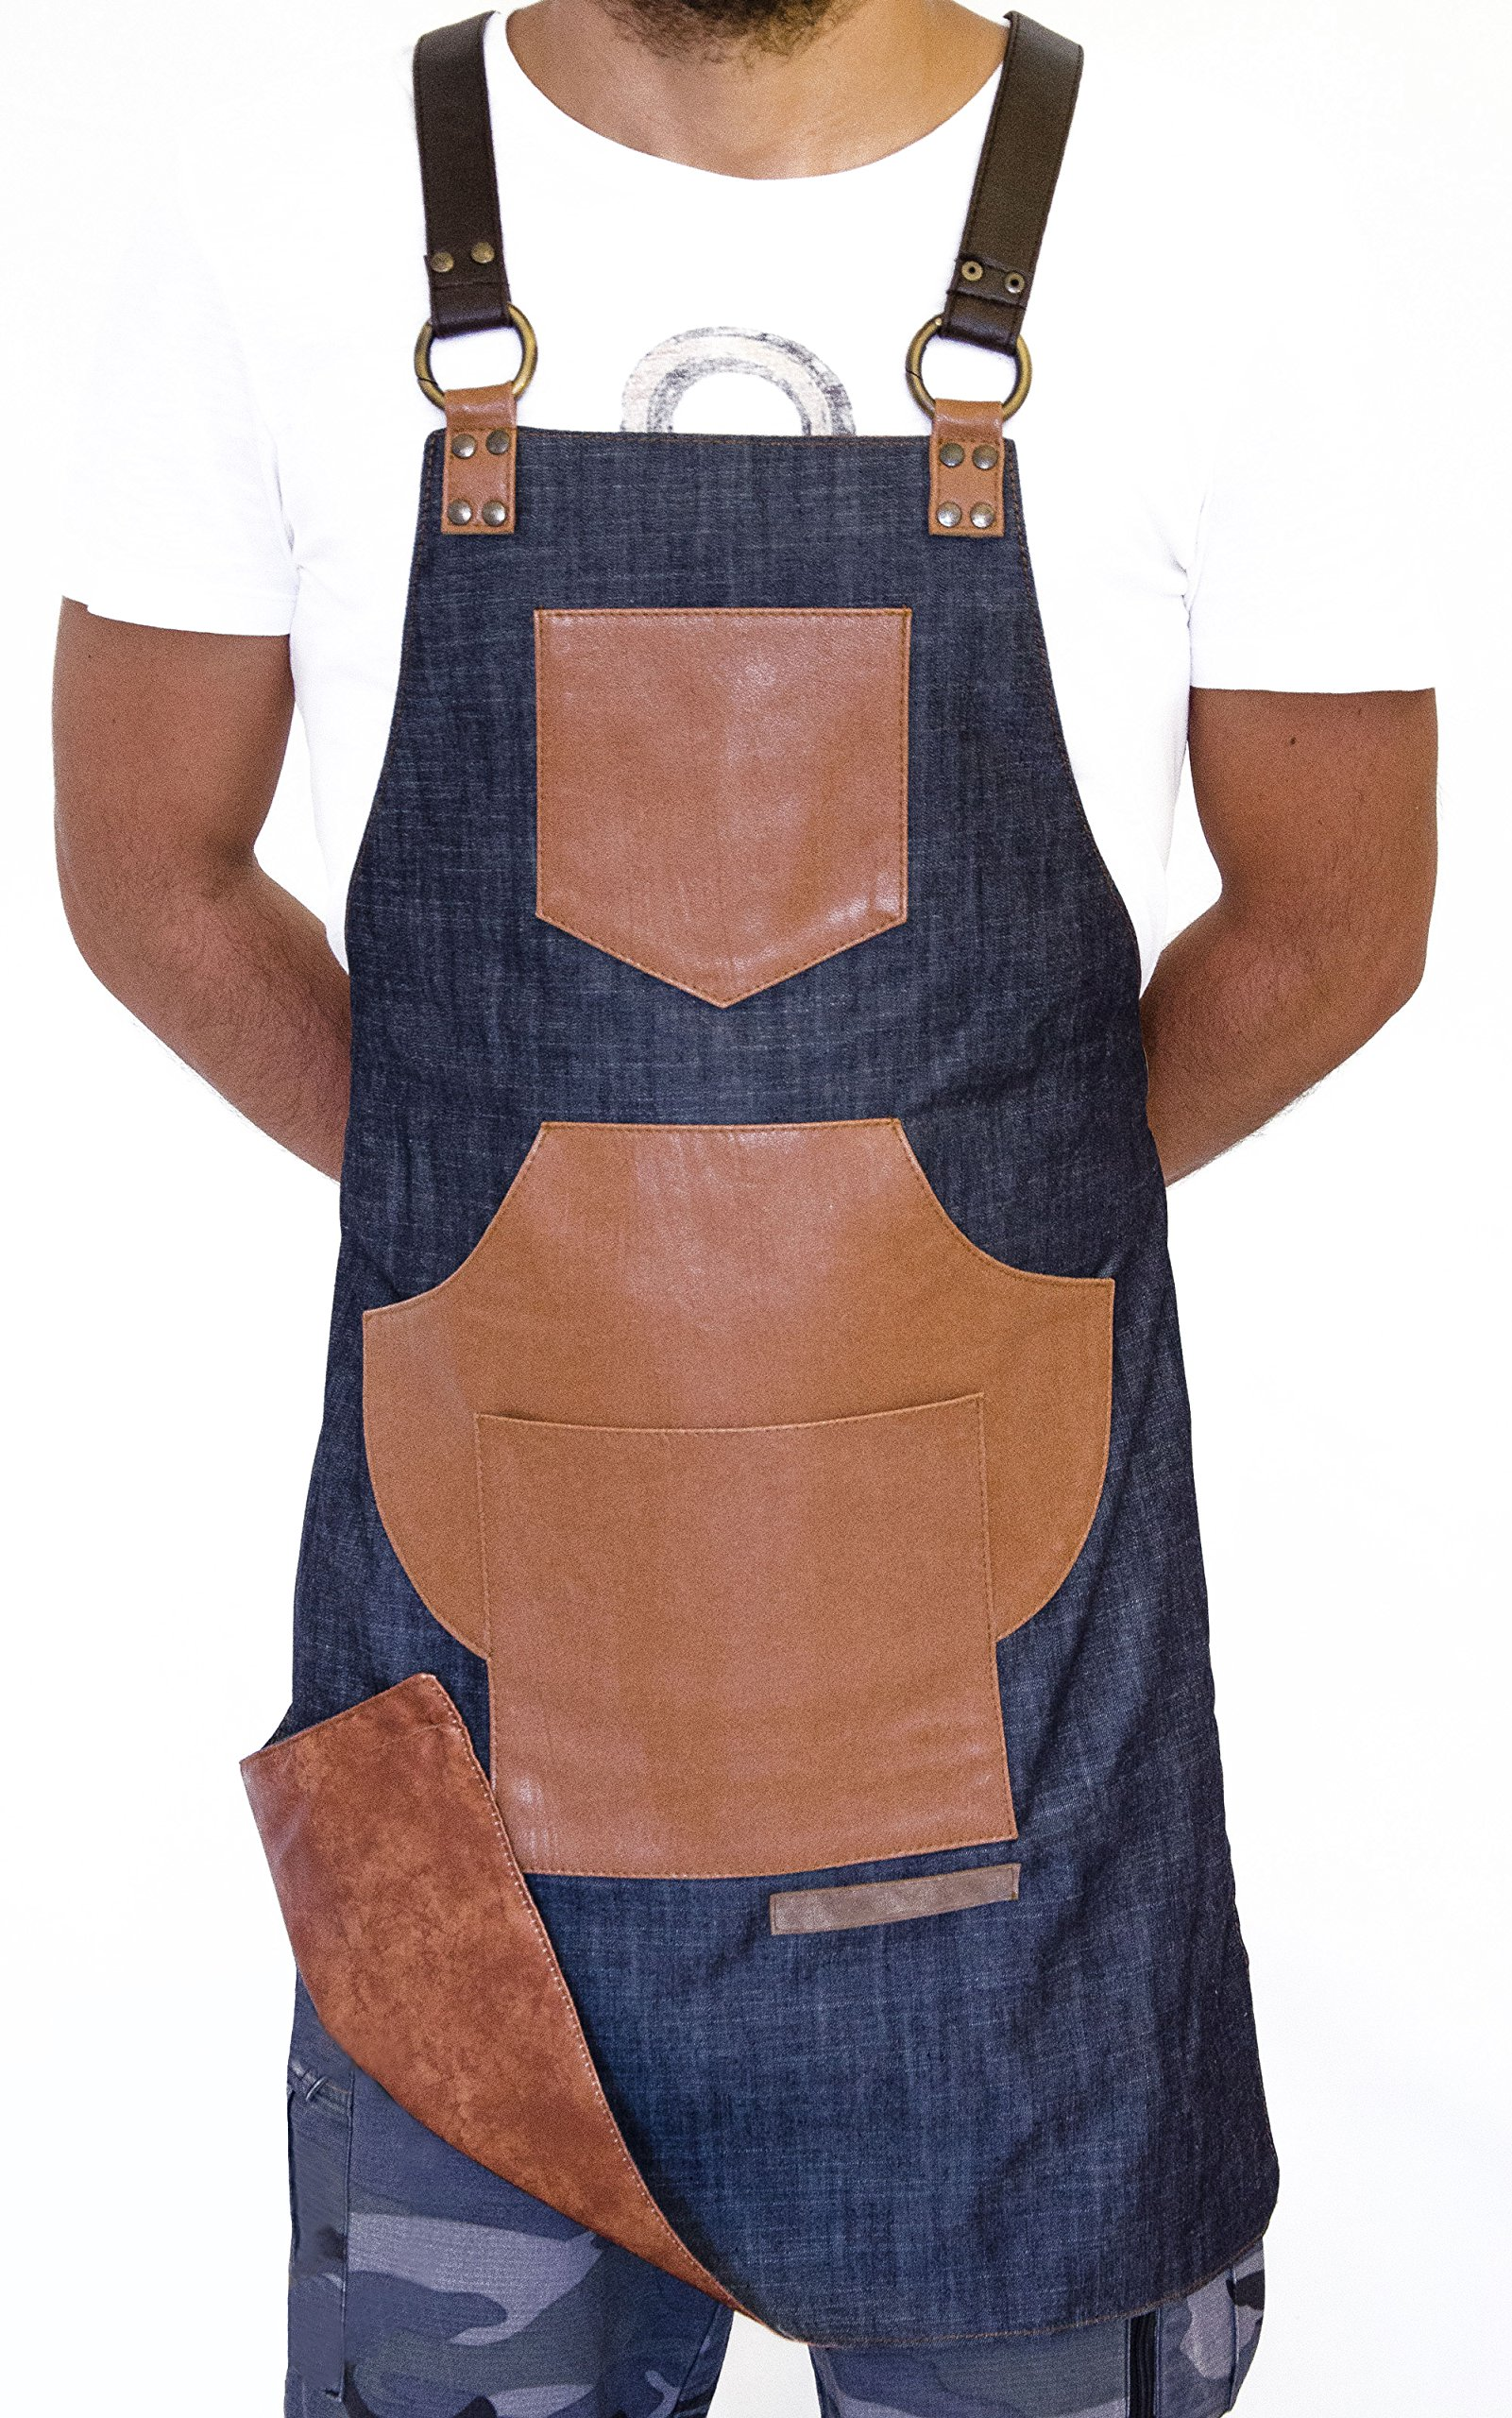 ApronNYC Work Apron with Tool Pockets & Adjustable Straps, Rafael-Denim